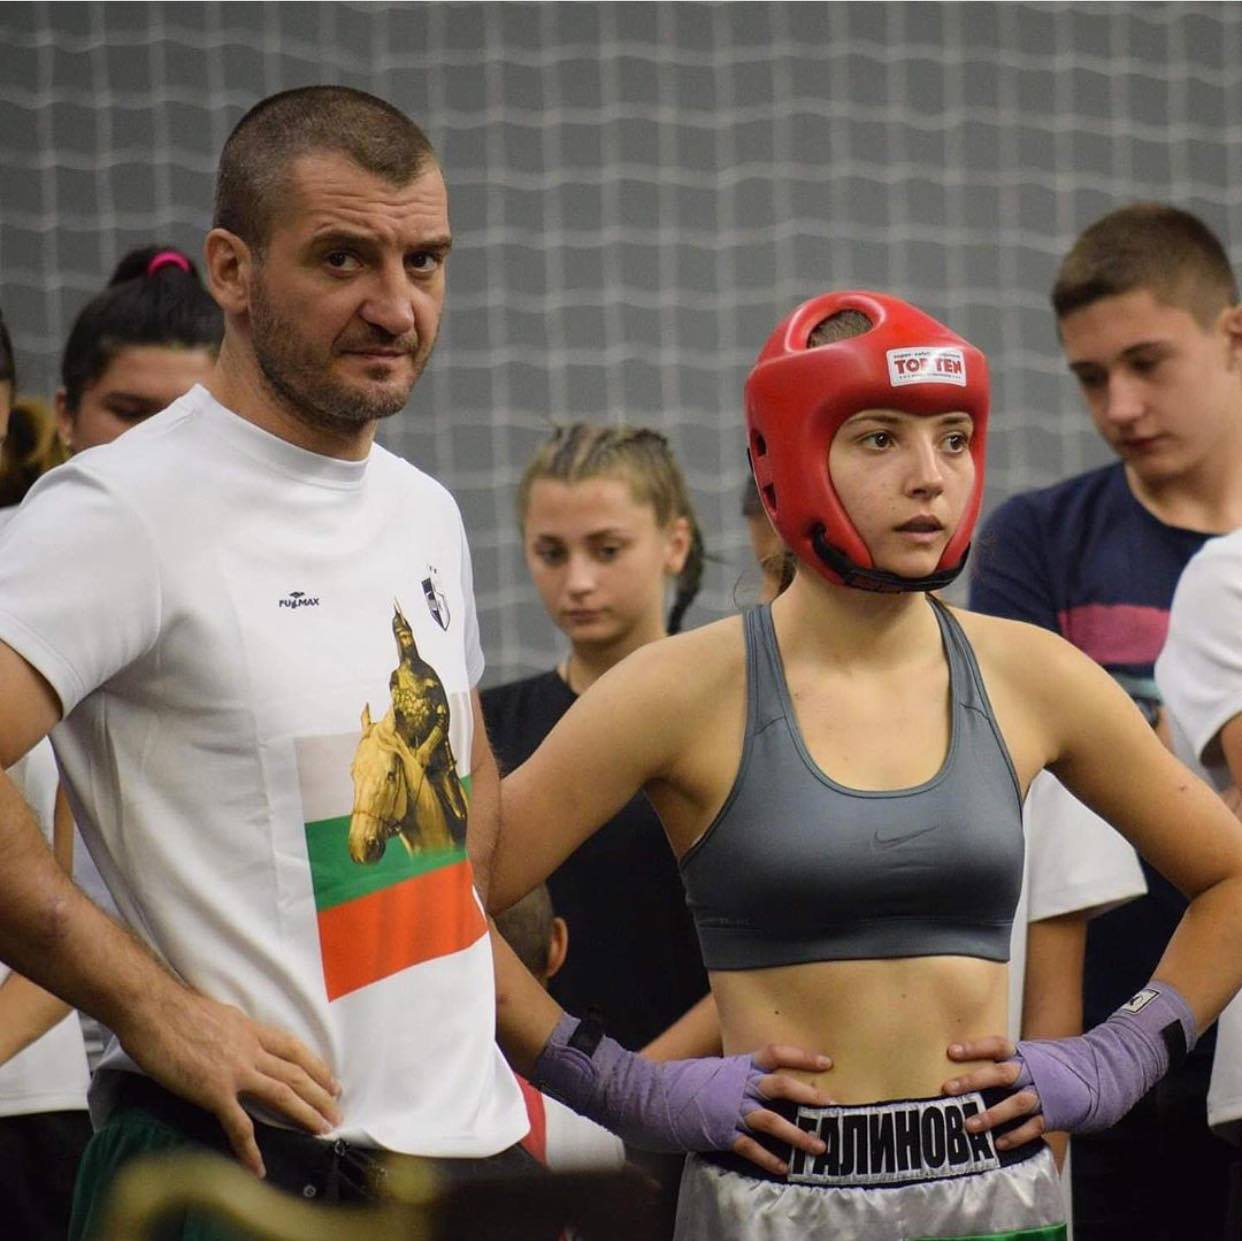 Polina Galinova